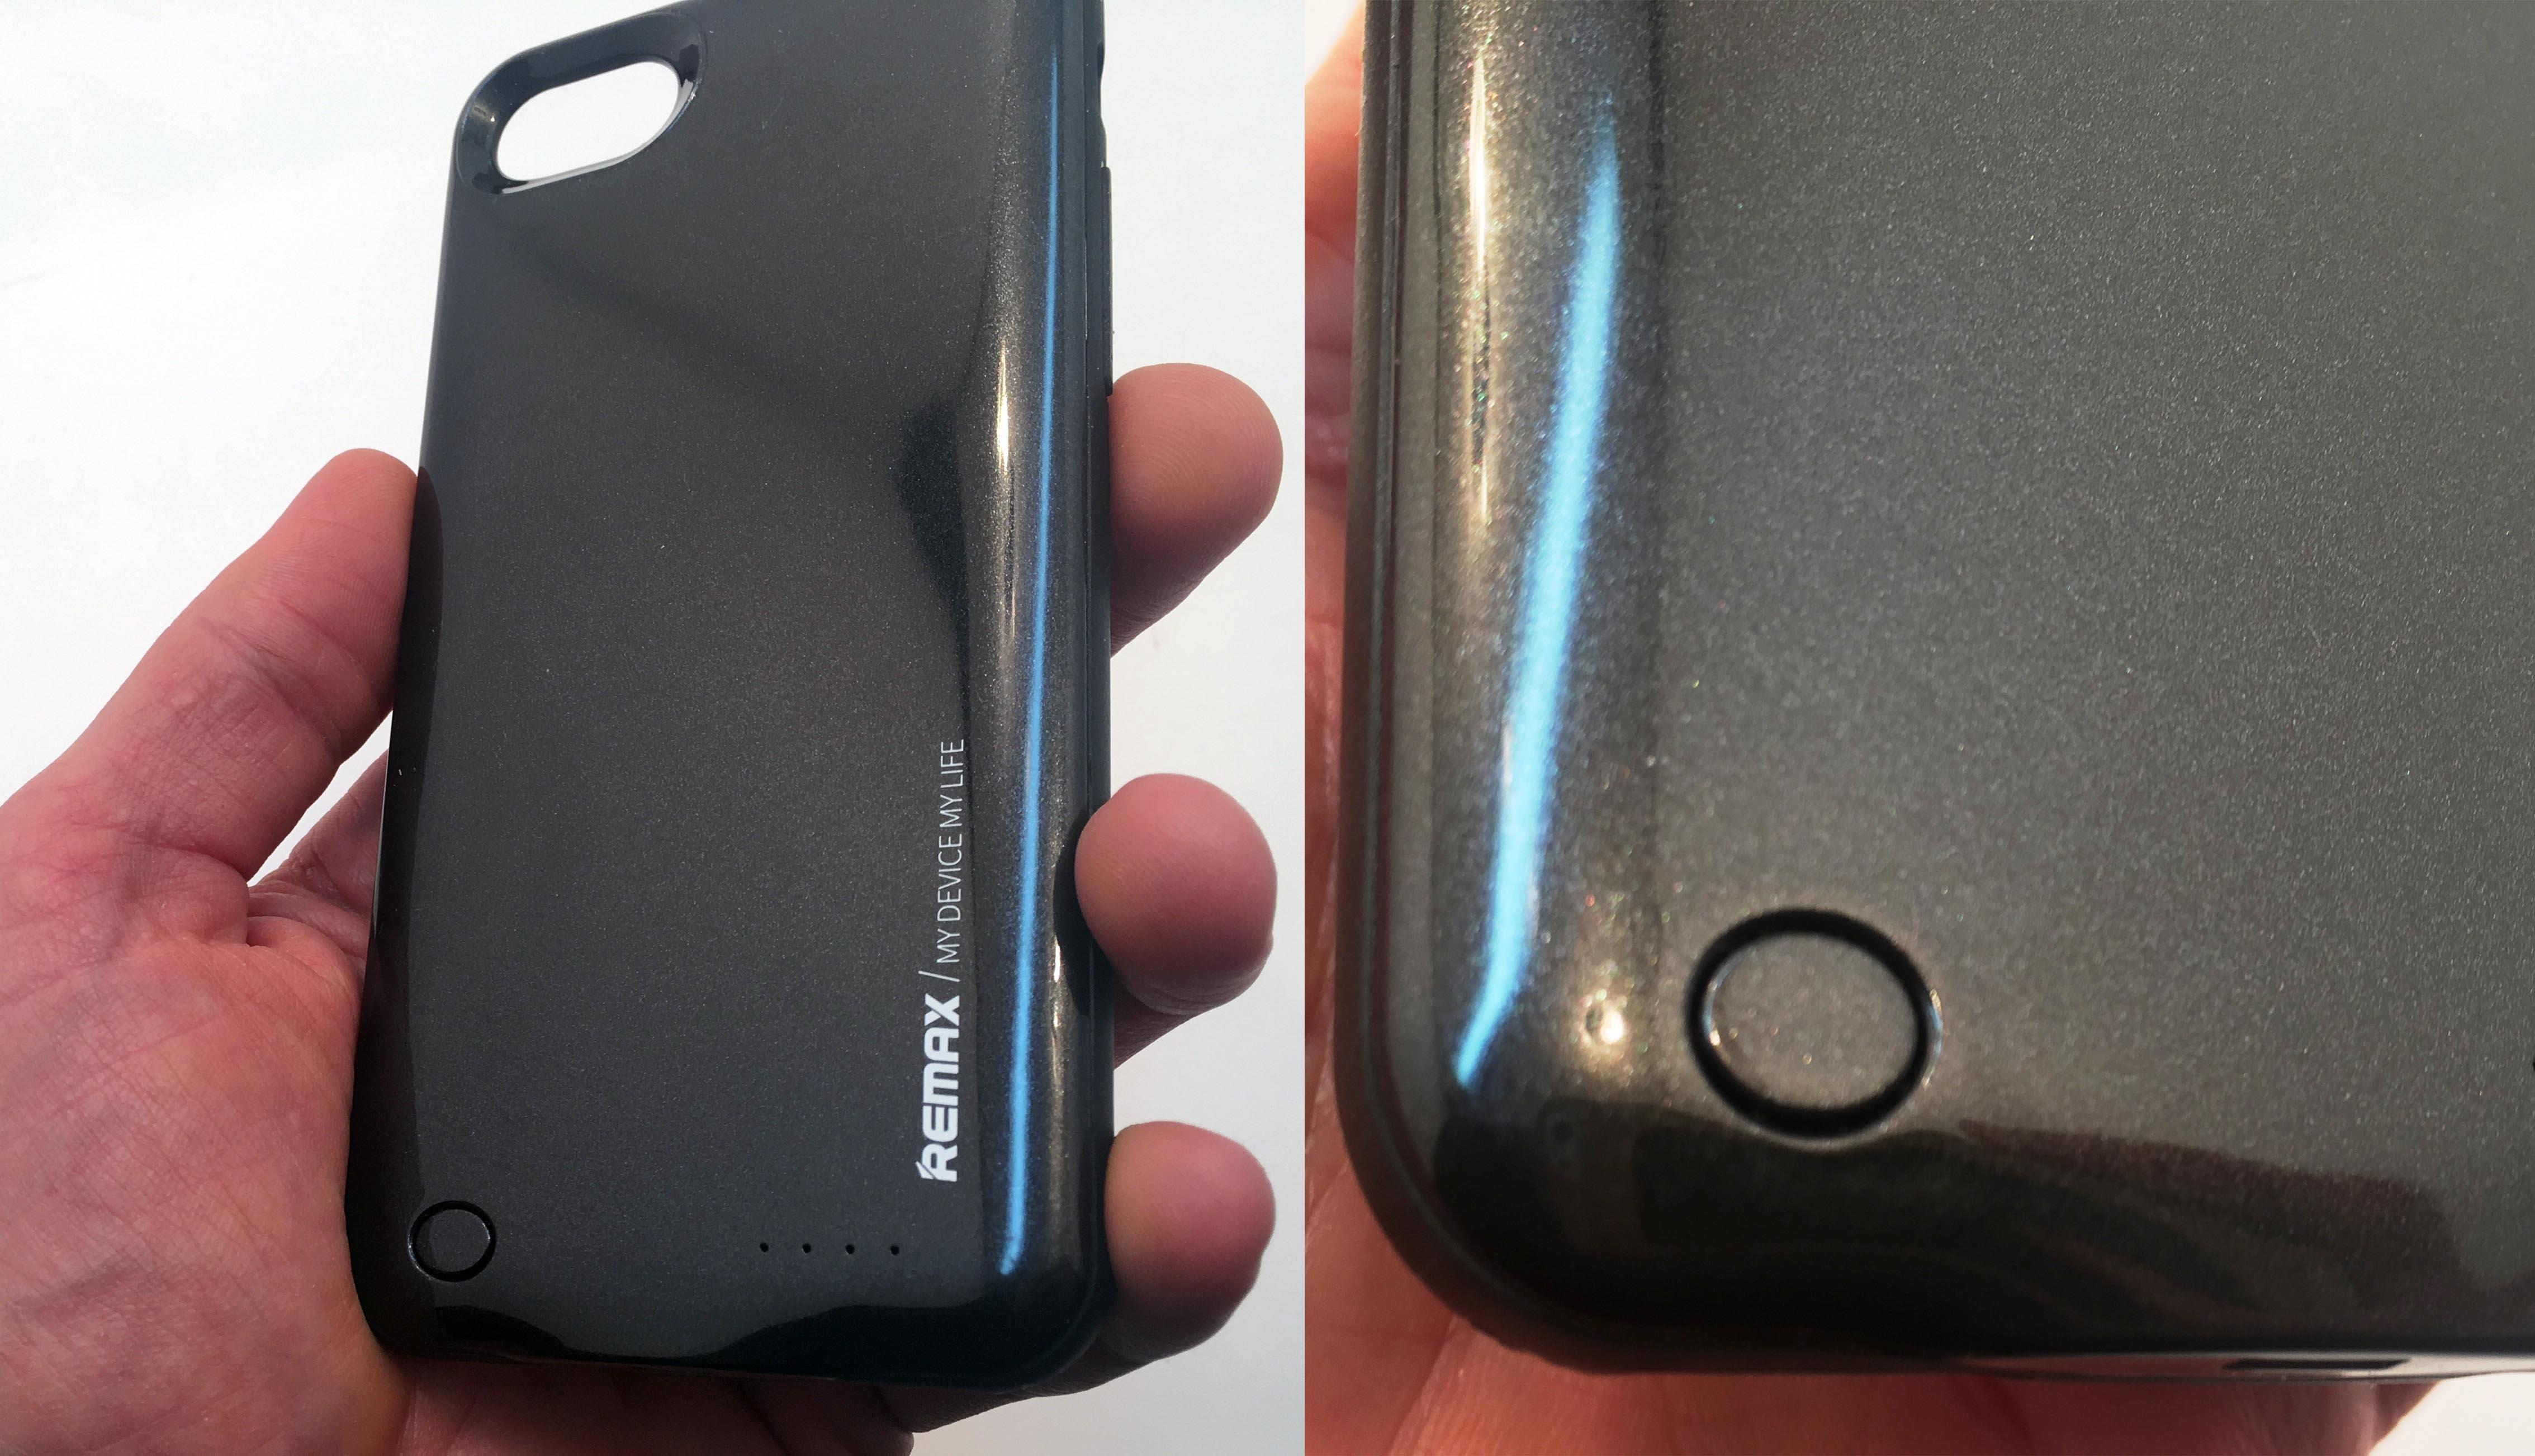 Чехол аккумулятор Remax, чёрный, кнопка вкл и выкл